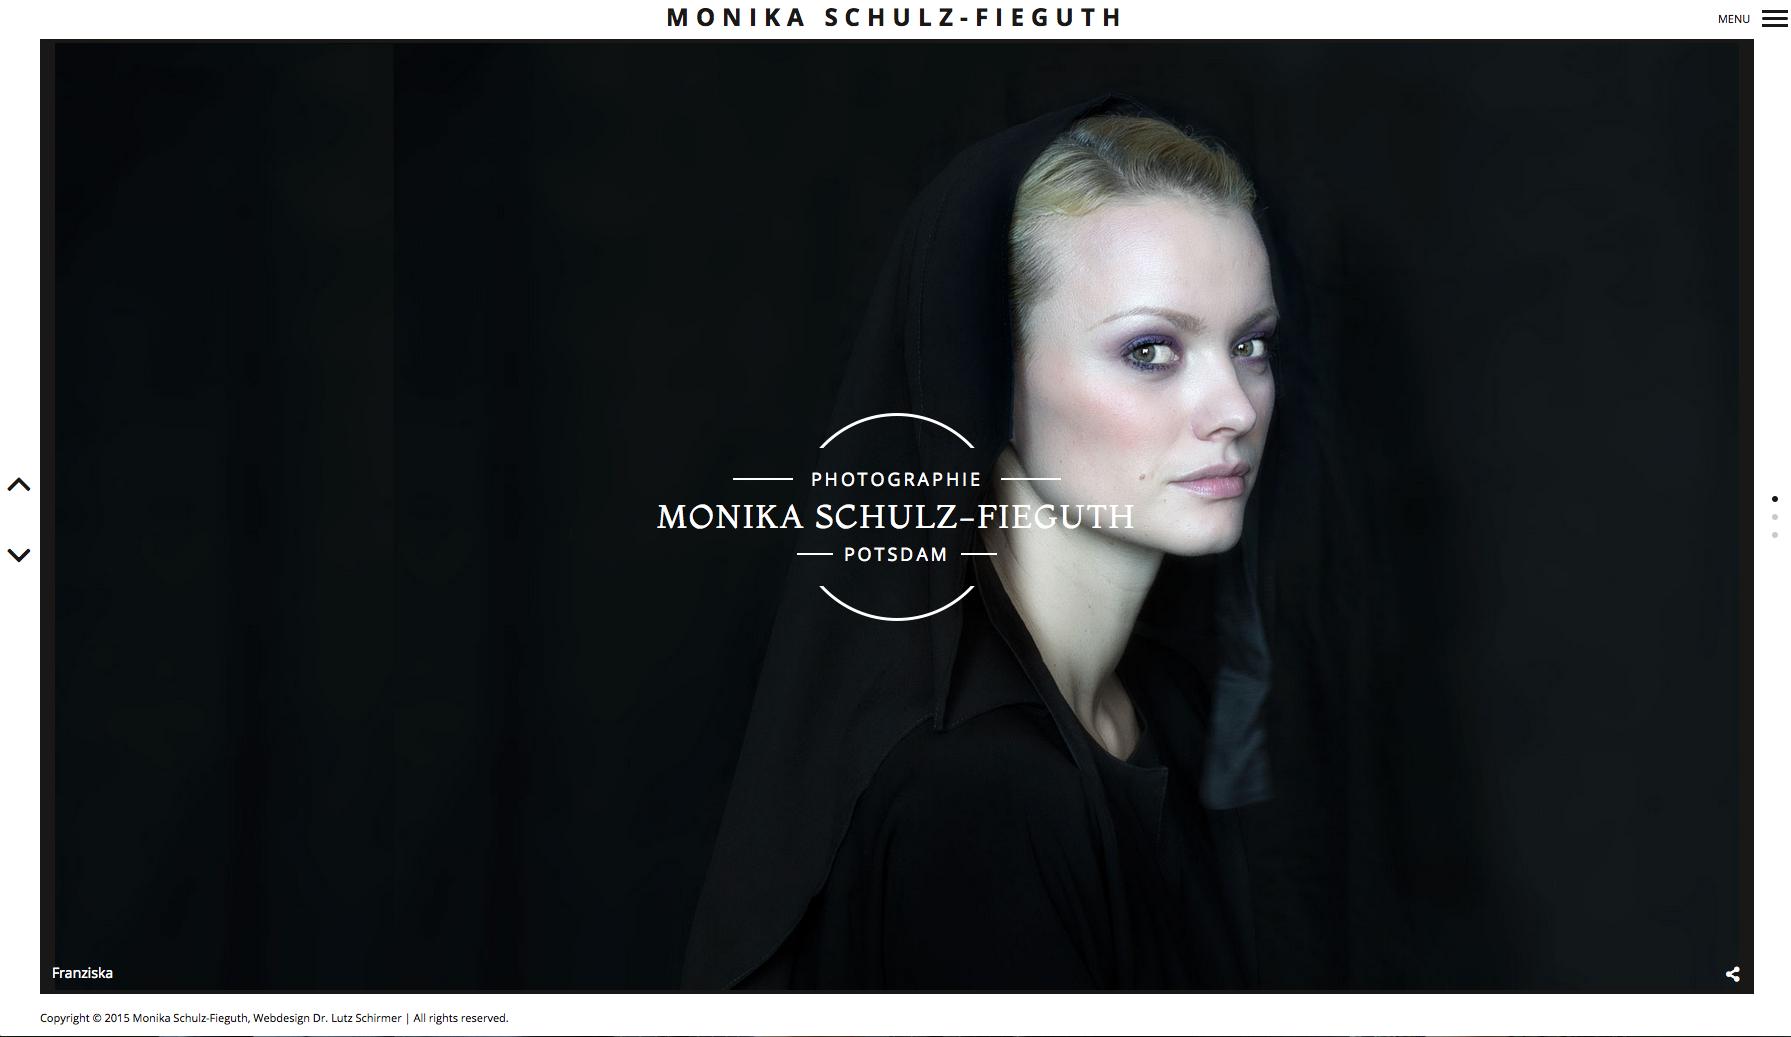 www.schulzfieguth.de